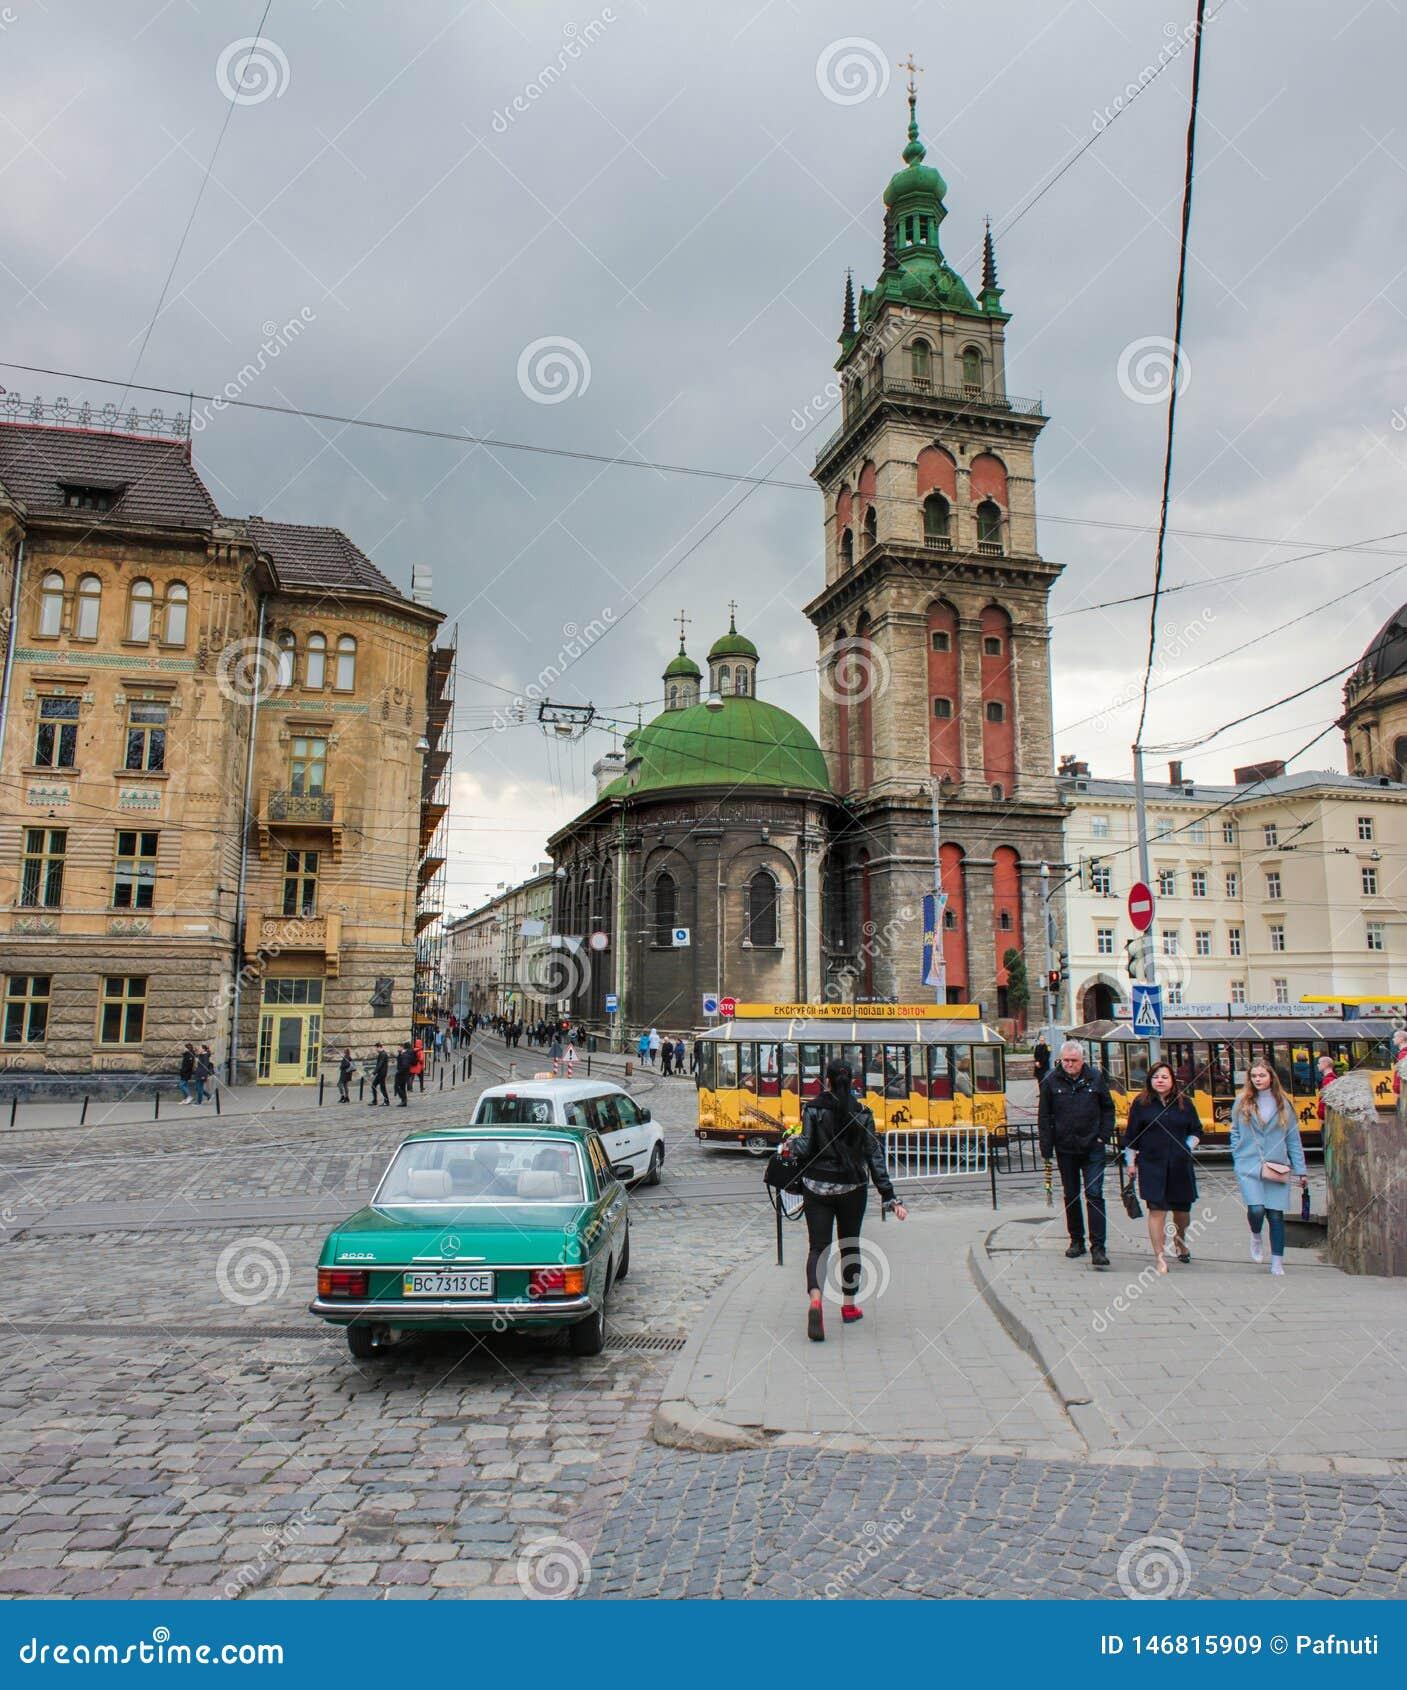 Lviv, de Oekraïne - April 19, 2019: Veronderstelling van Heilige Maagdelijke Mary Church Tower van Korniakt lviv - prachtige arch